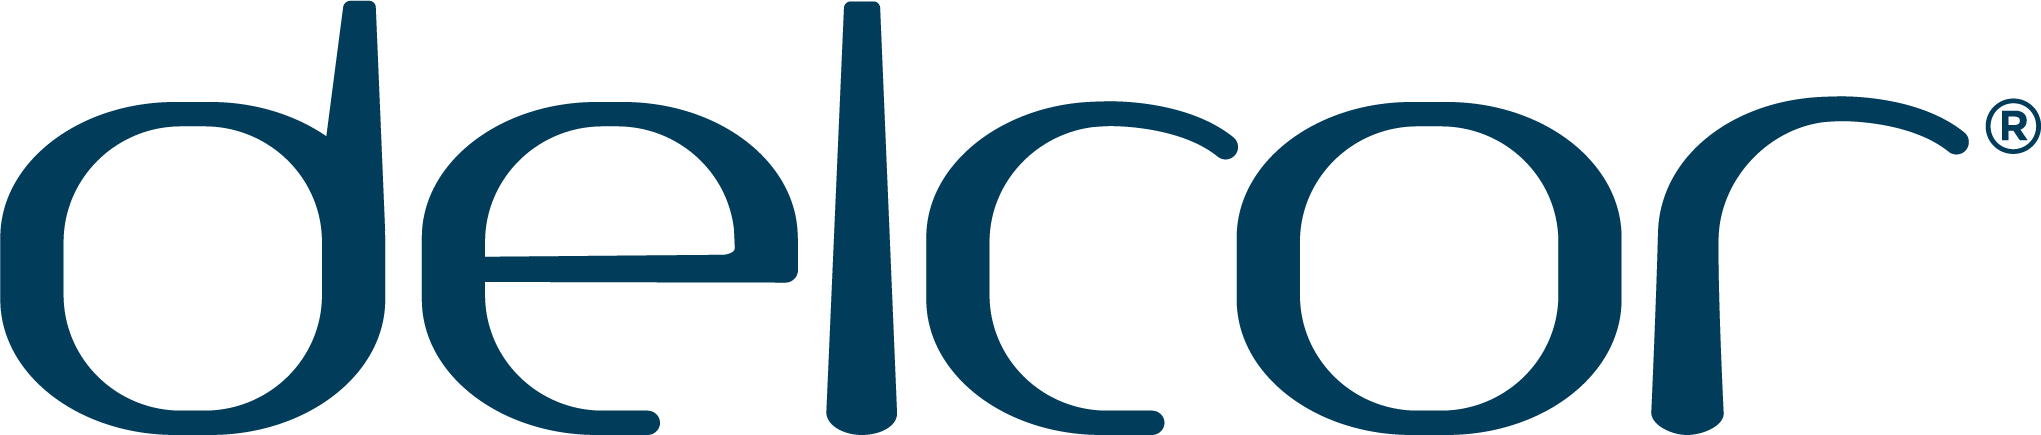 DelCor Logo PMS302C Blue.png